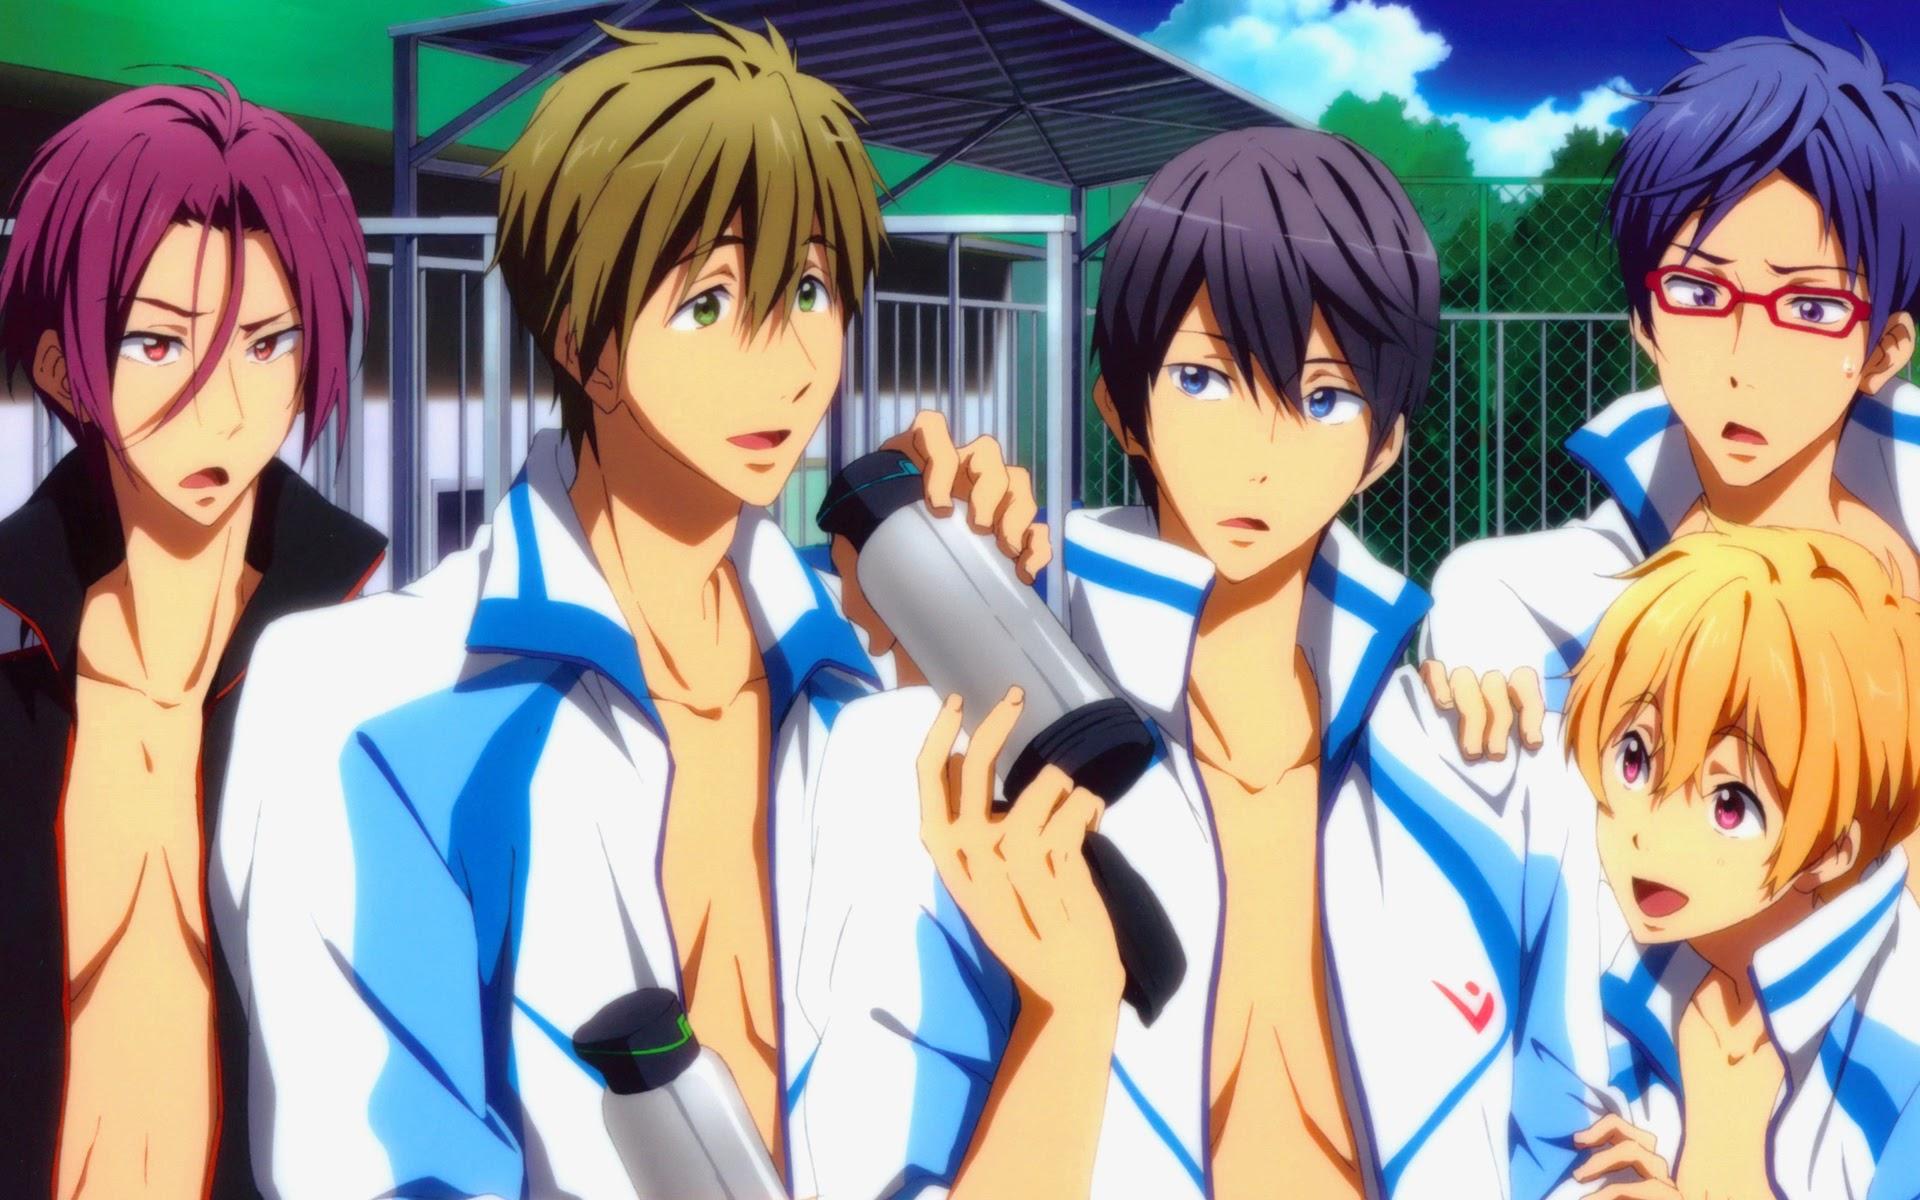 Anime Ipad Hd Wallpaper   Hot Girls Wallpaper 1920x1200